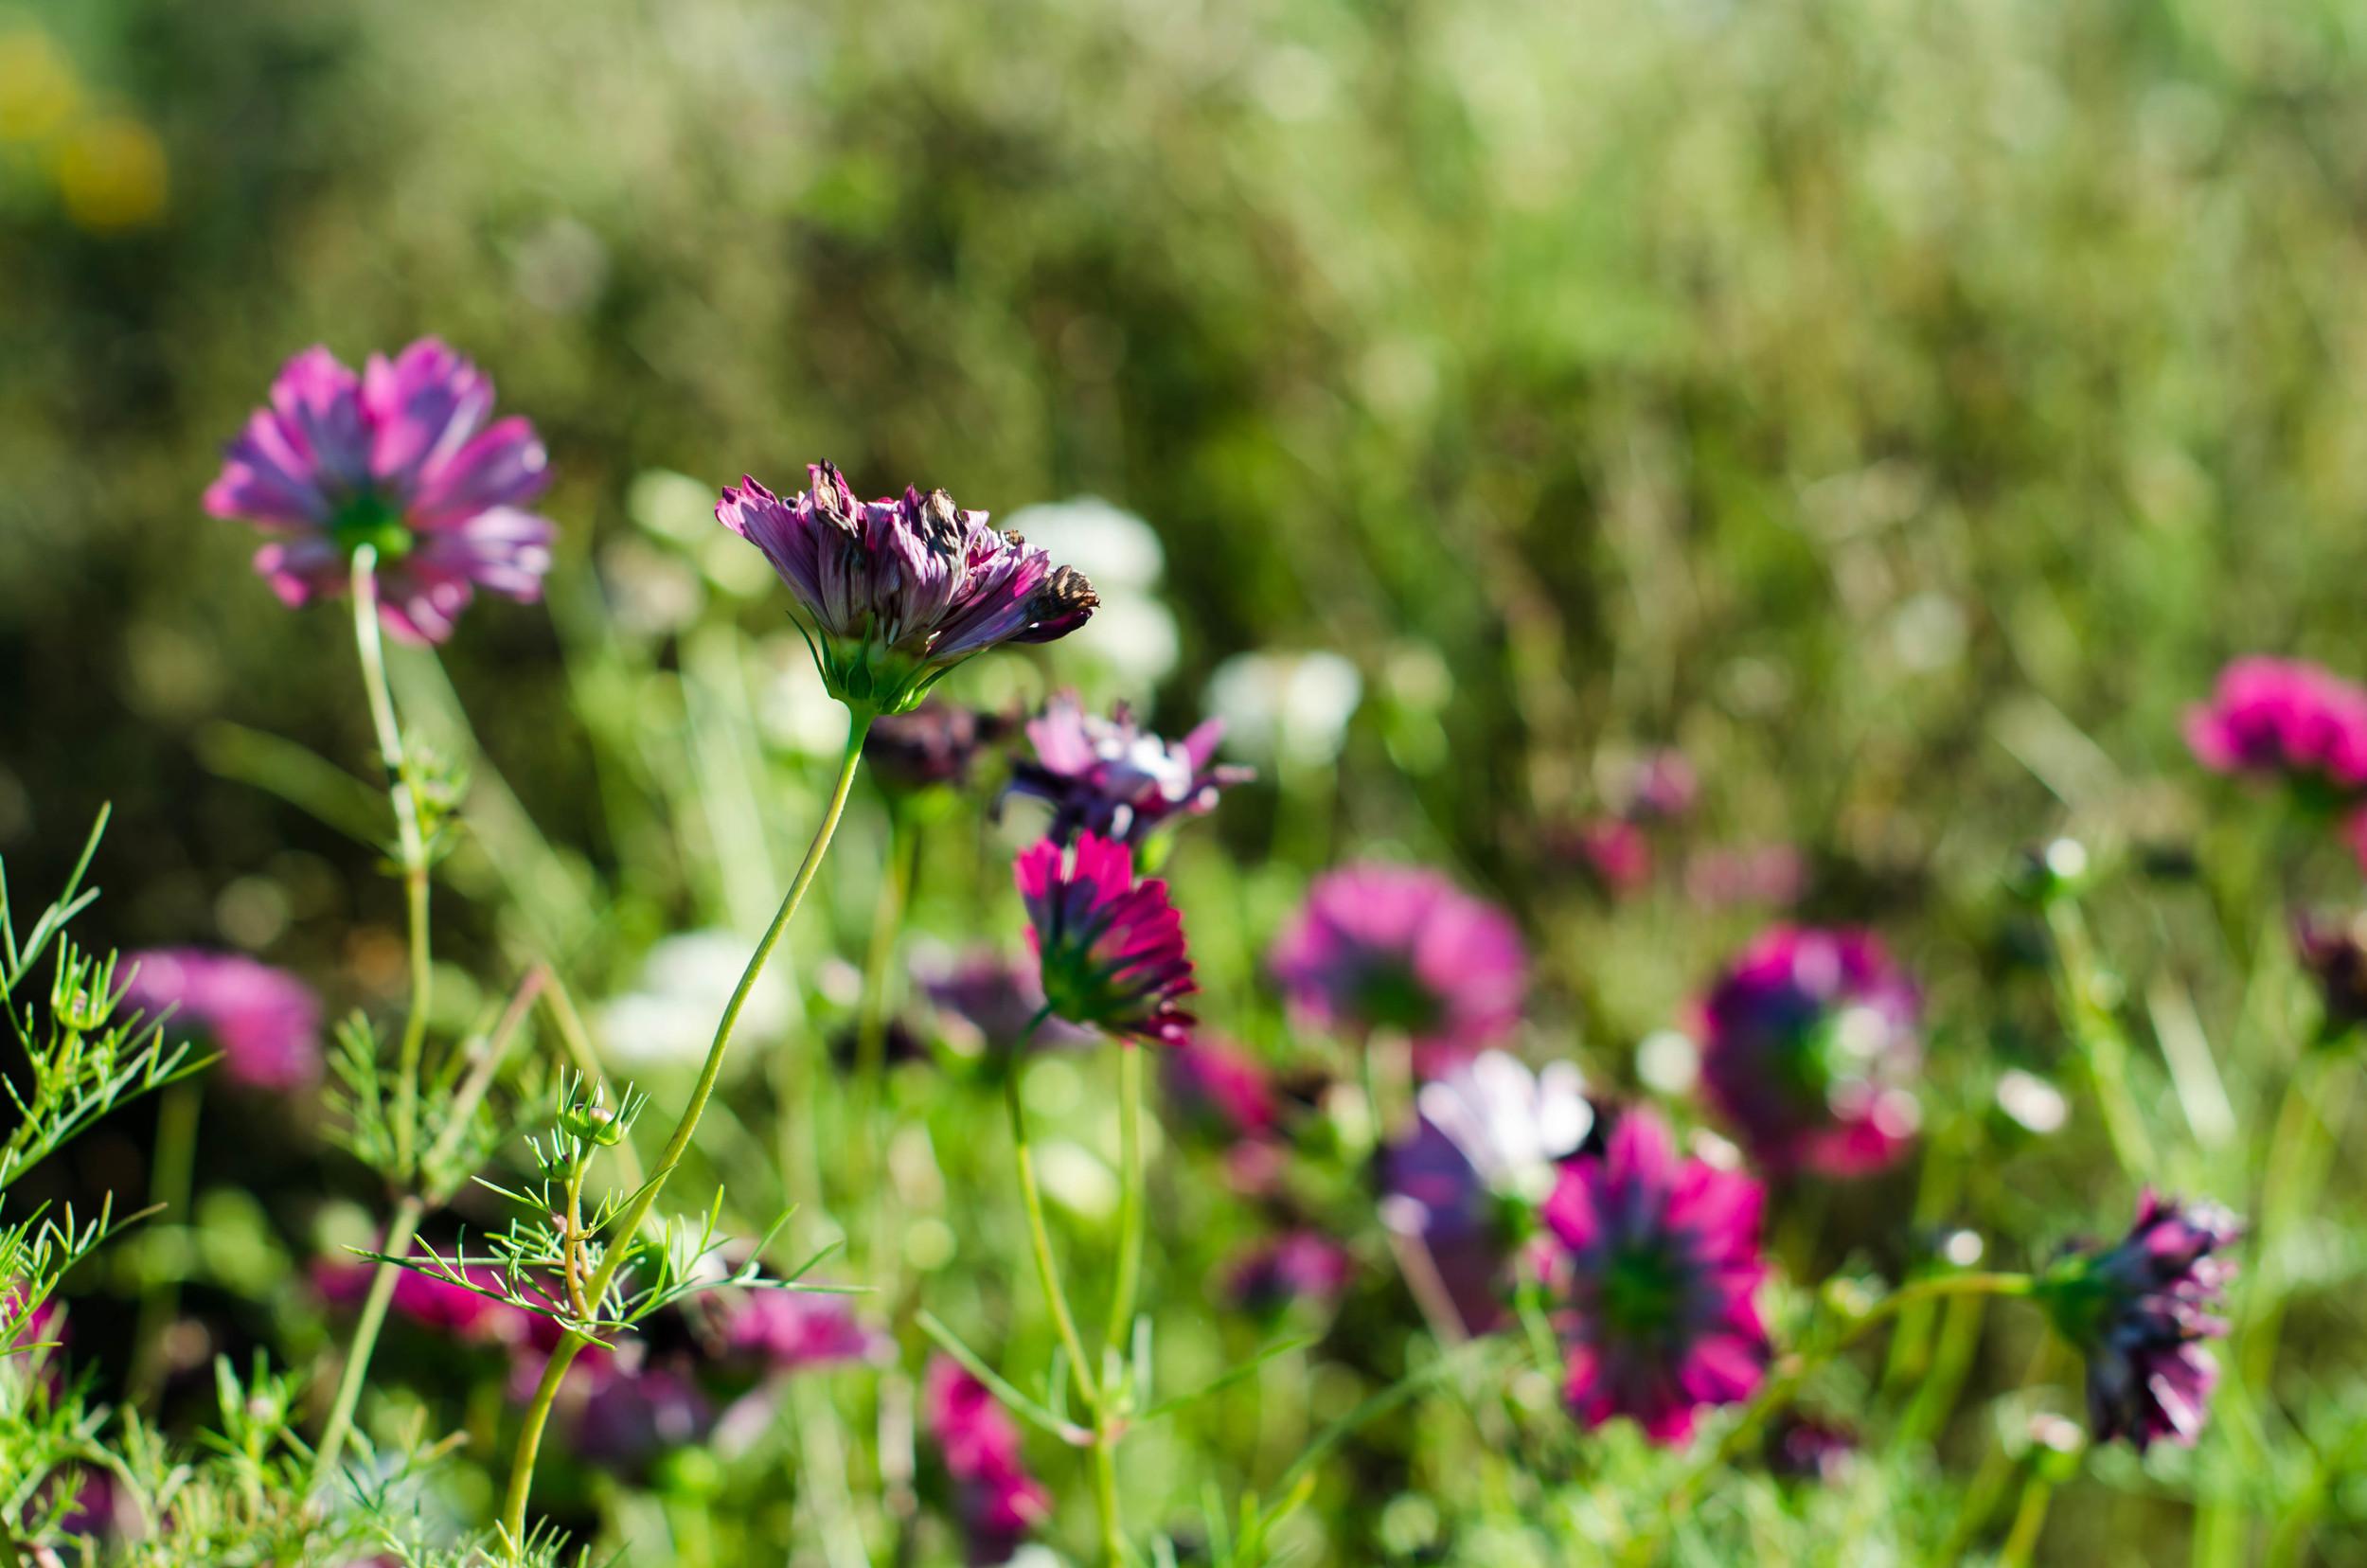 ROSE & IVY Journal Wildflower Fields